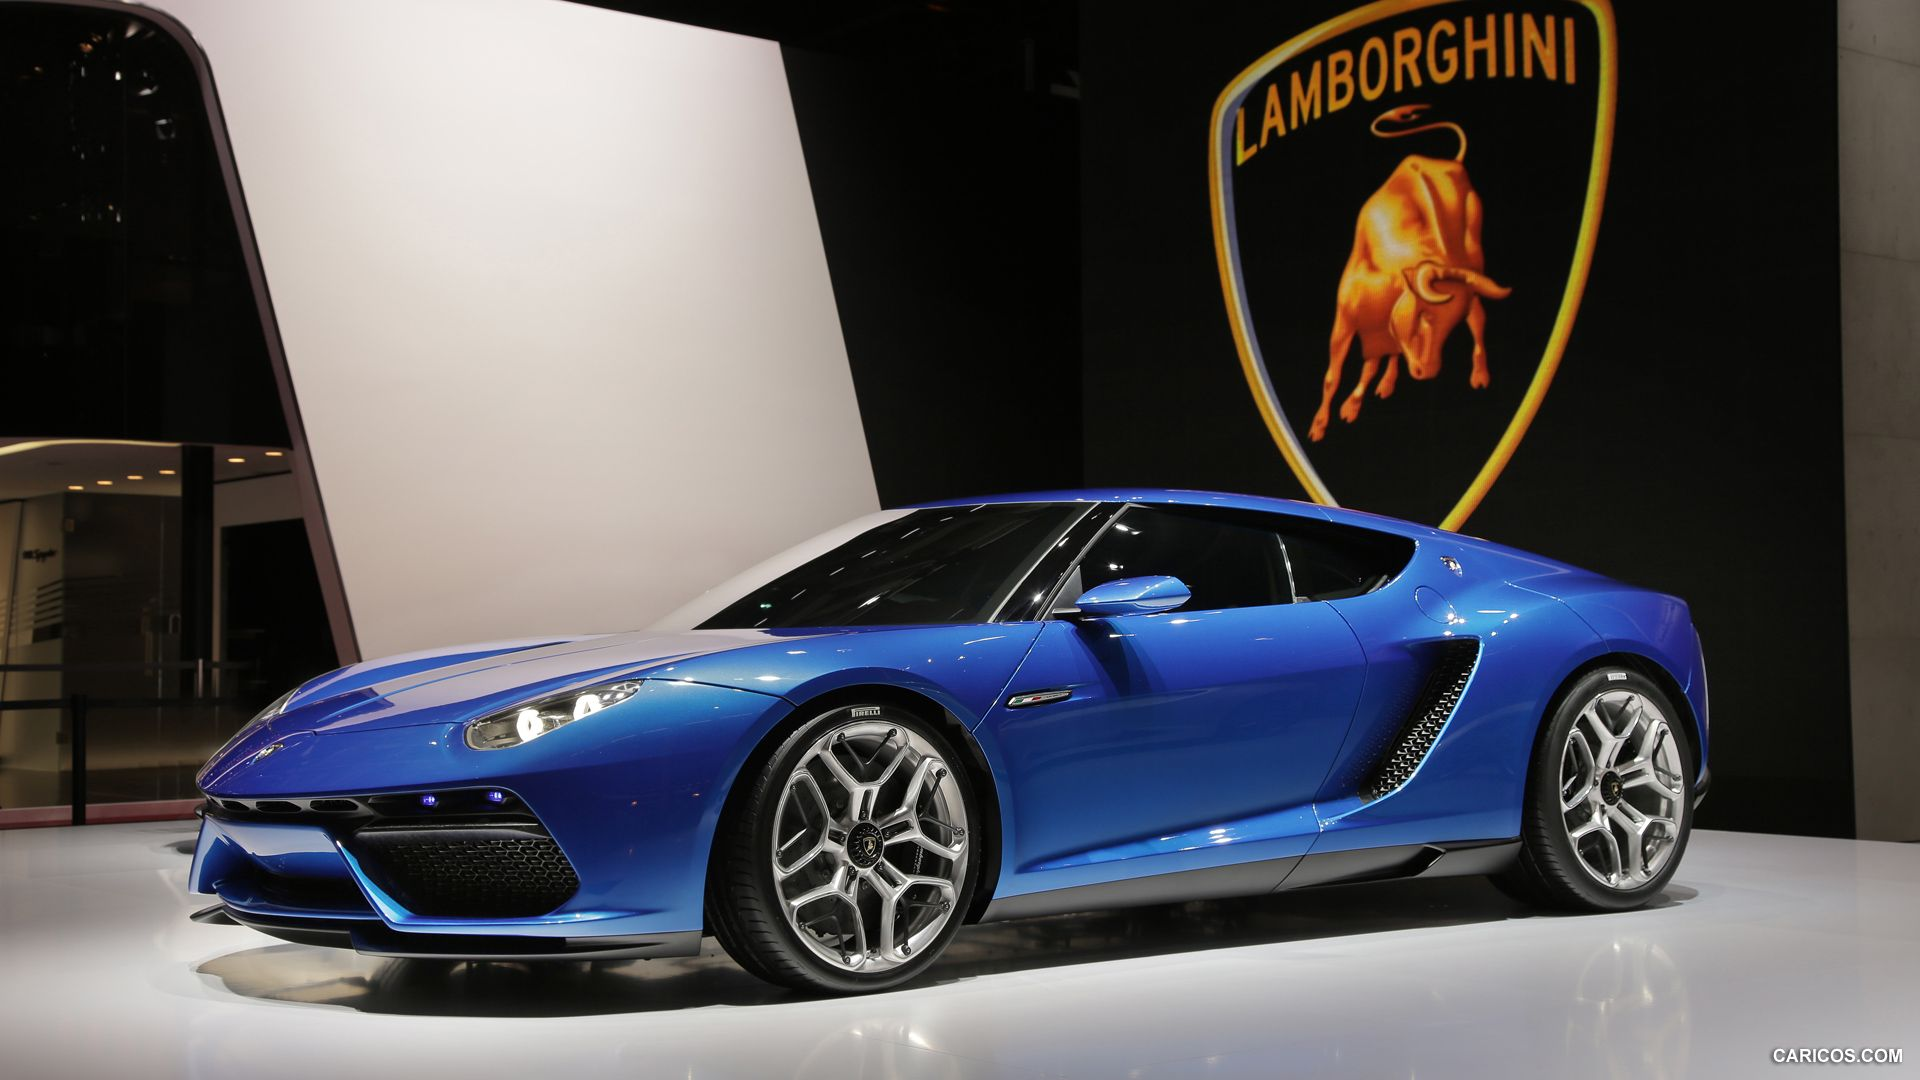 Awesome Lamborghini Asterion Picture Lamborghini Asterion